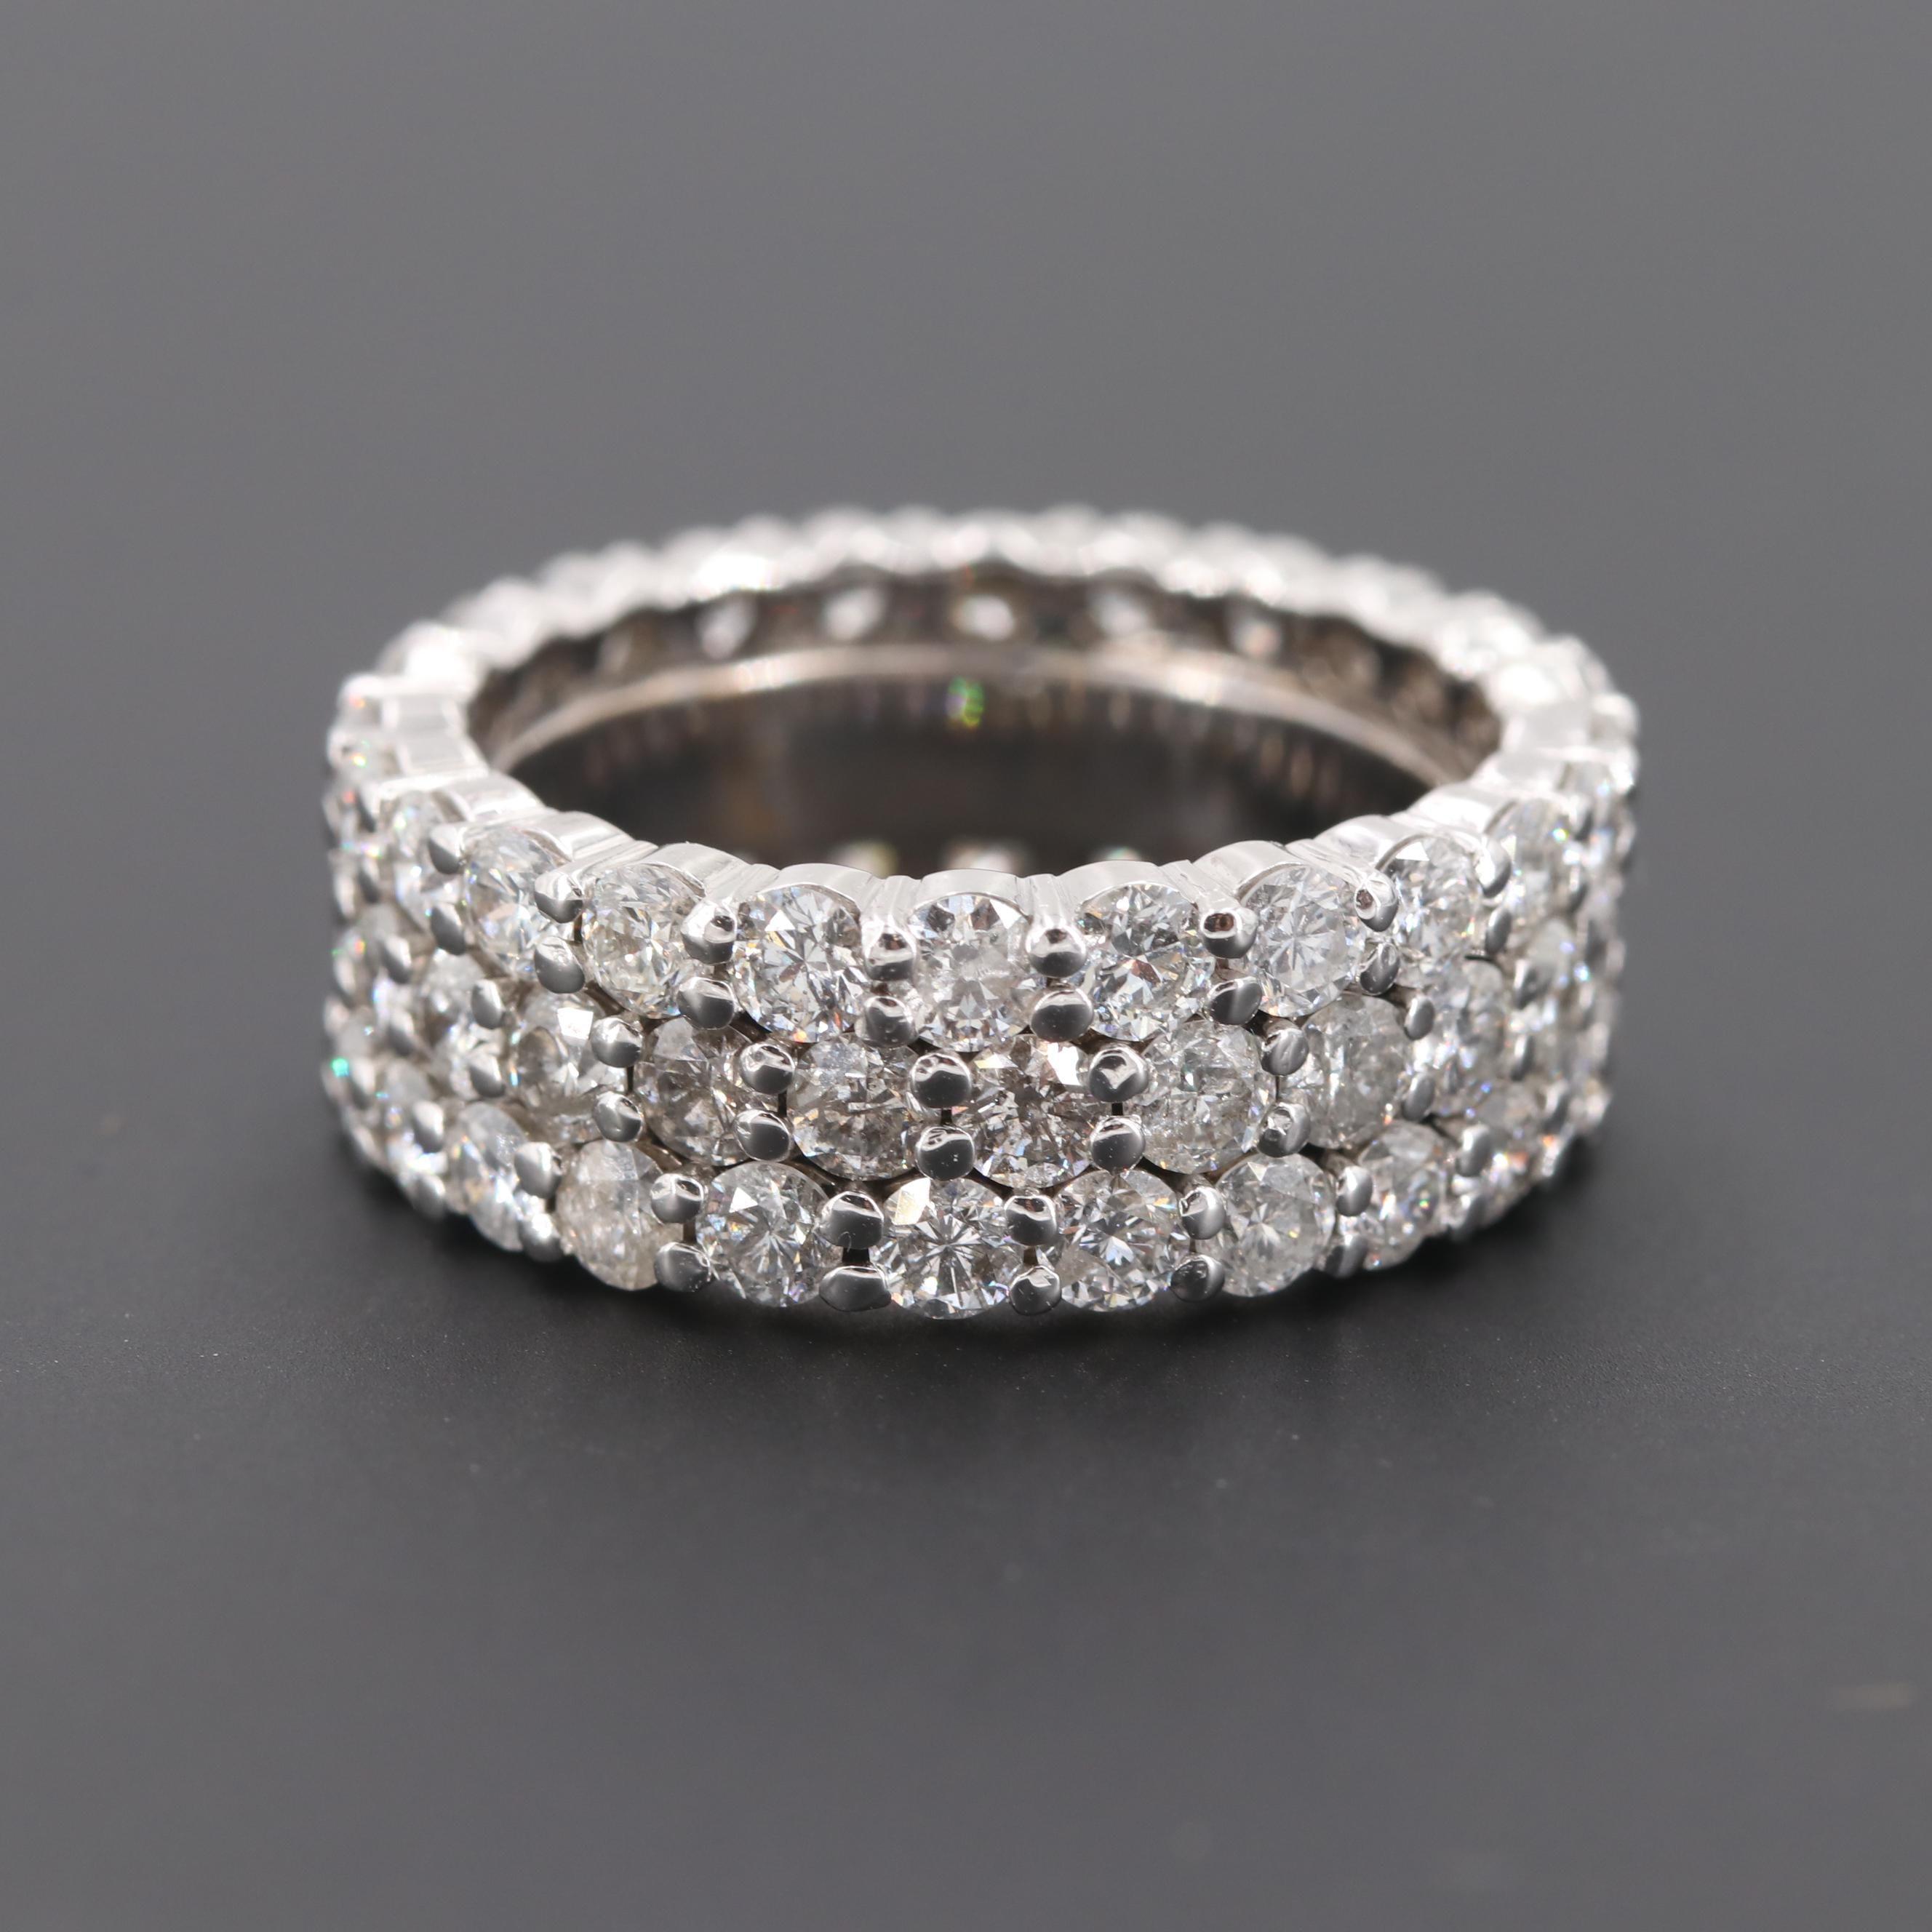 14K White Gold 7.20 CTW Diamond Eternity Ring